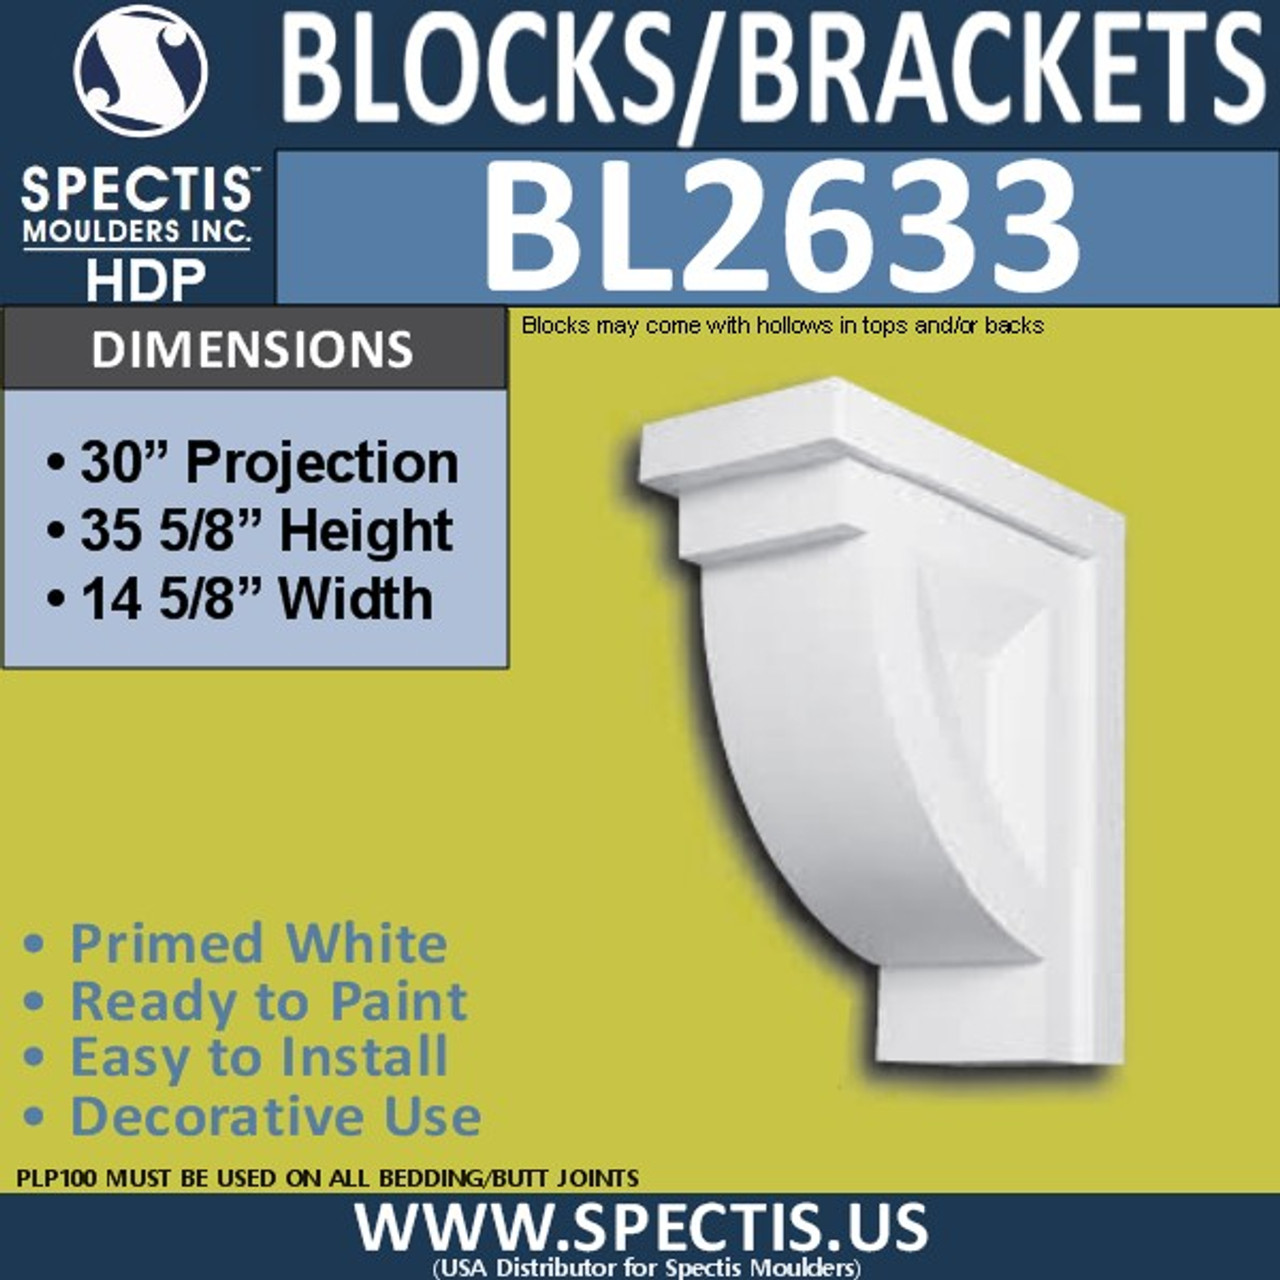 "BL2633 Eave Block or Bracket 14.625""W x 35.6""H x 30"" P"